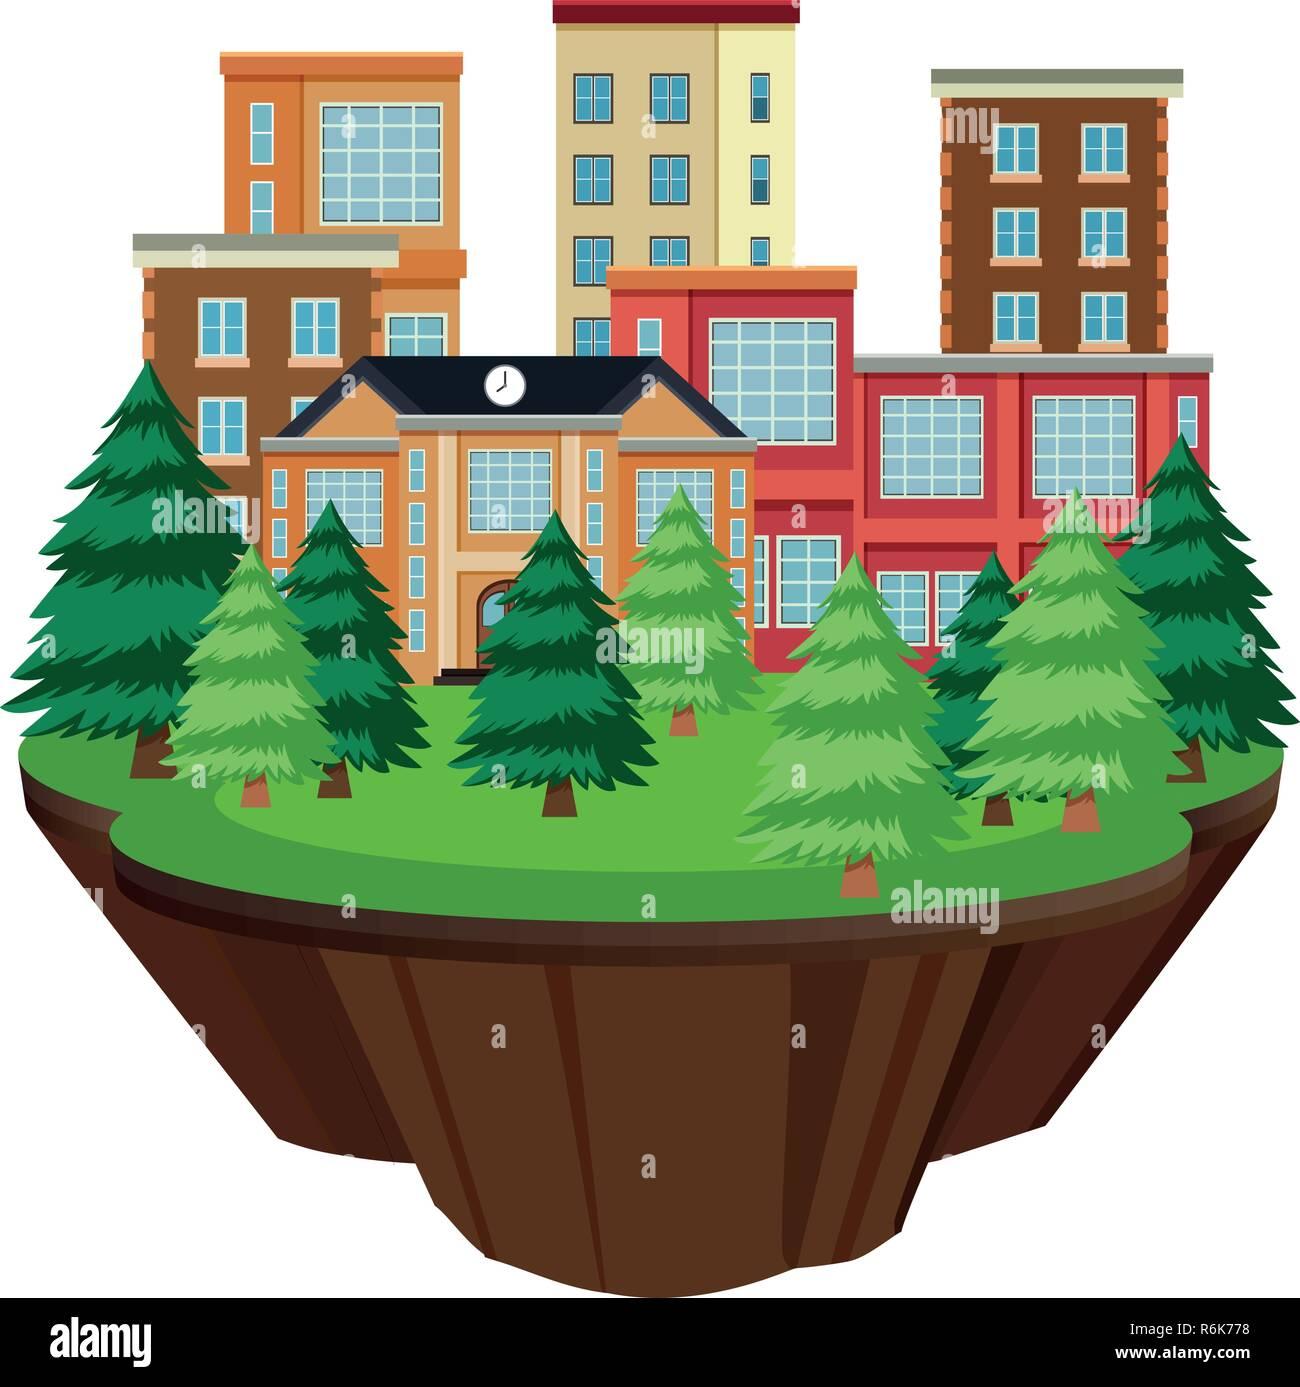 Isolated island urban building illustration - Stock Vector